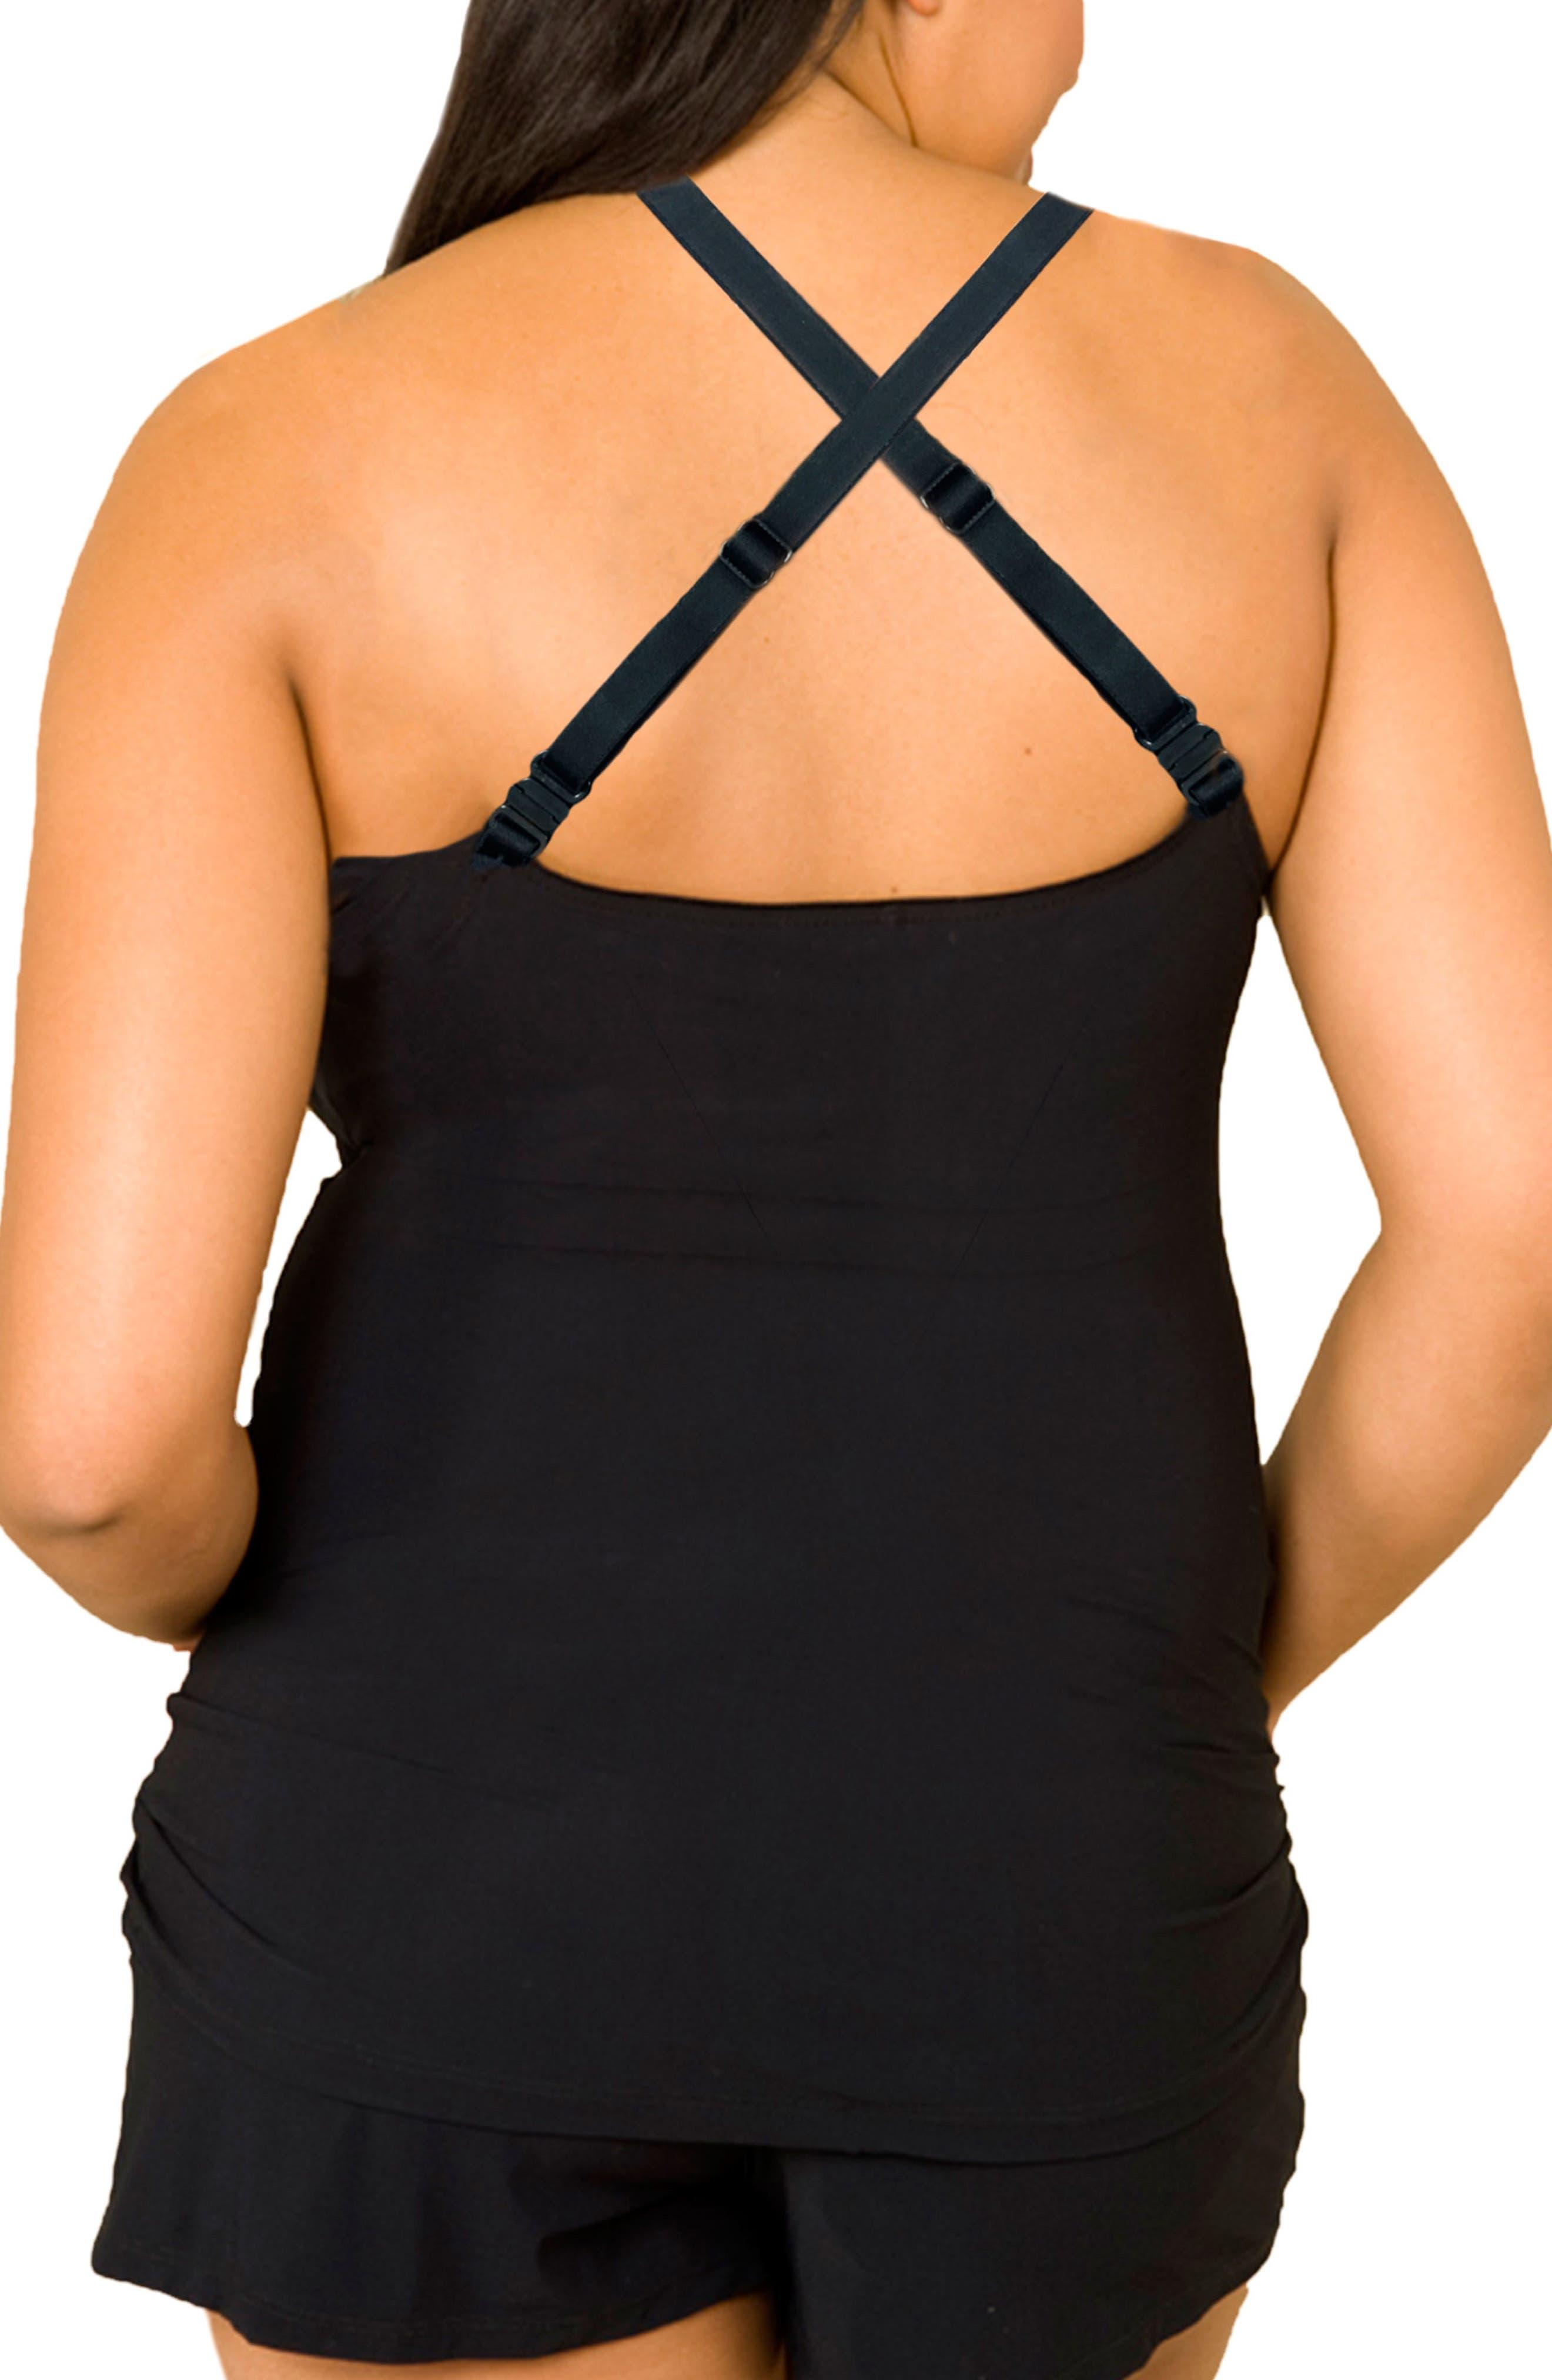 Alternate Image 3  - Bella Materna Choice Full Figure Maternity/Nursing Camisole